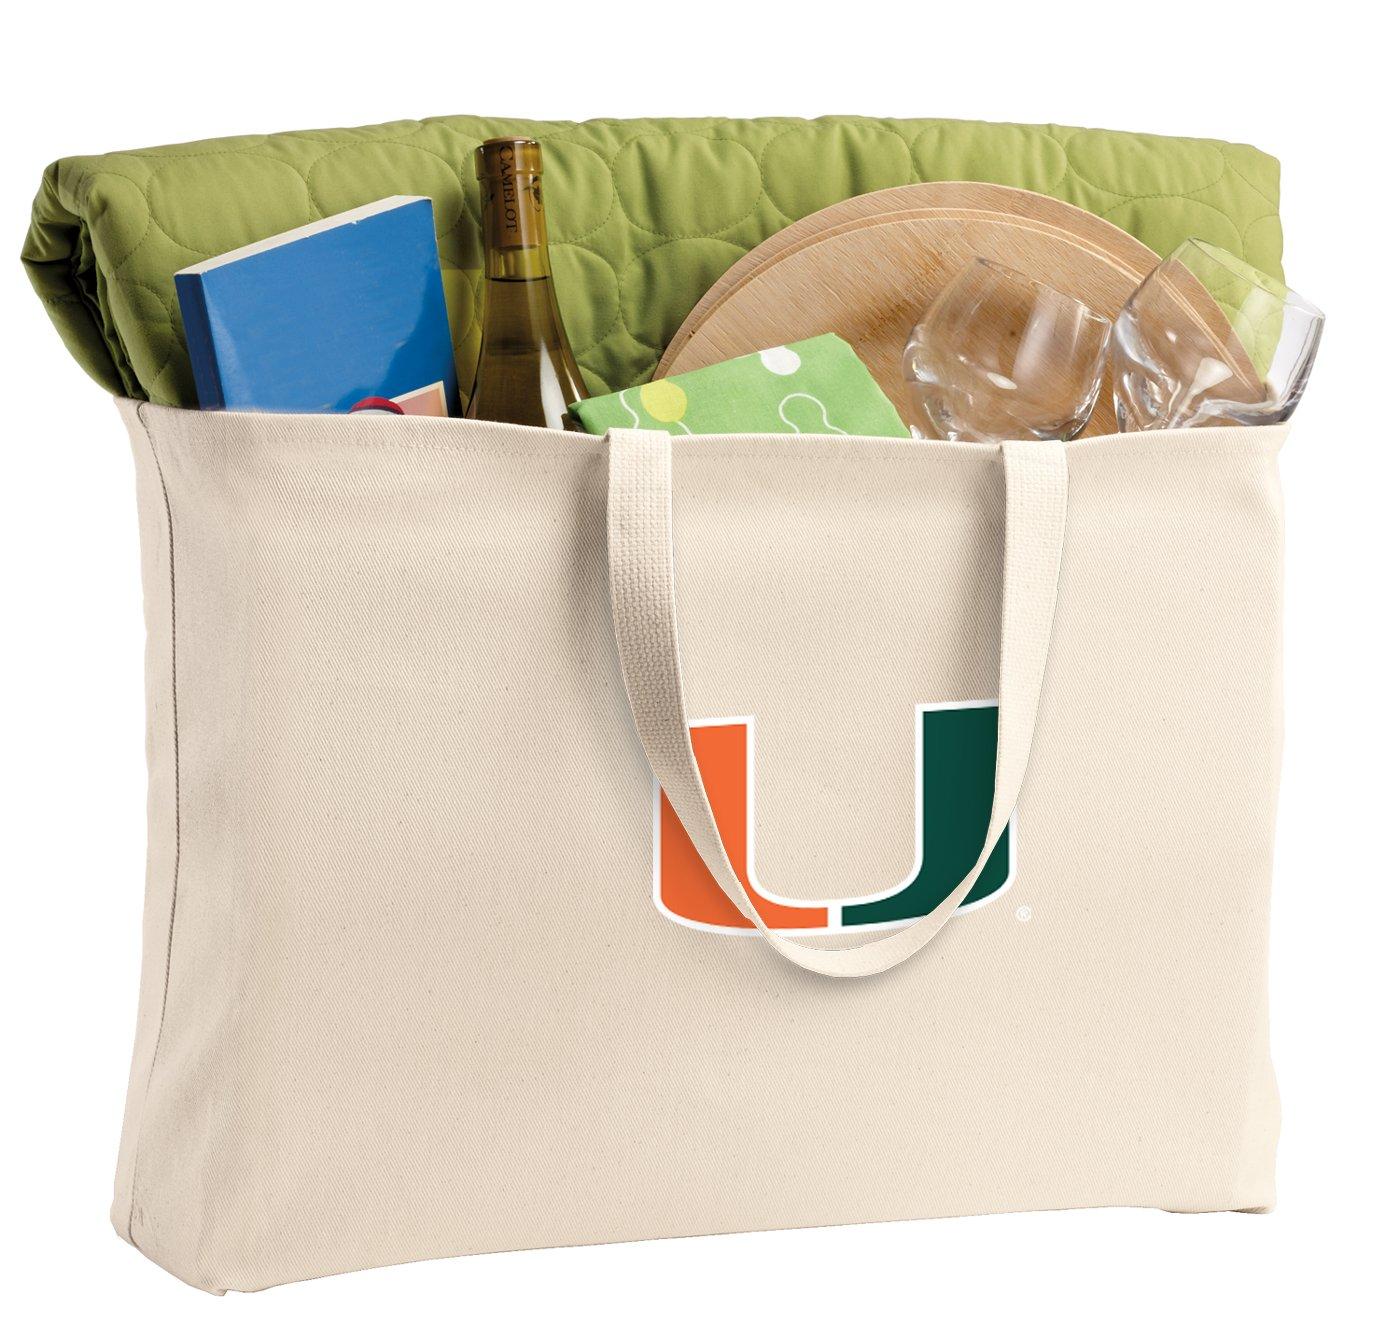 JUMBO University of Miami Tote Bag or Large Canvas Miami Canes Shopping Bag